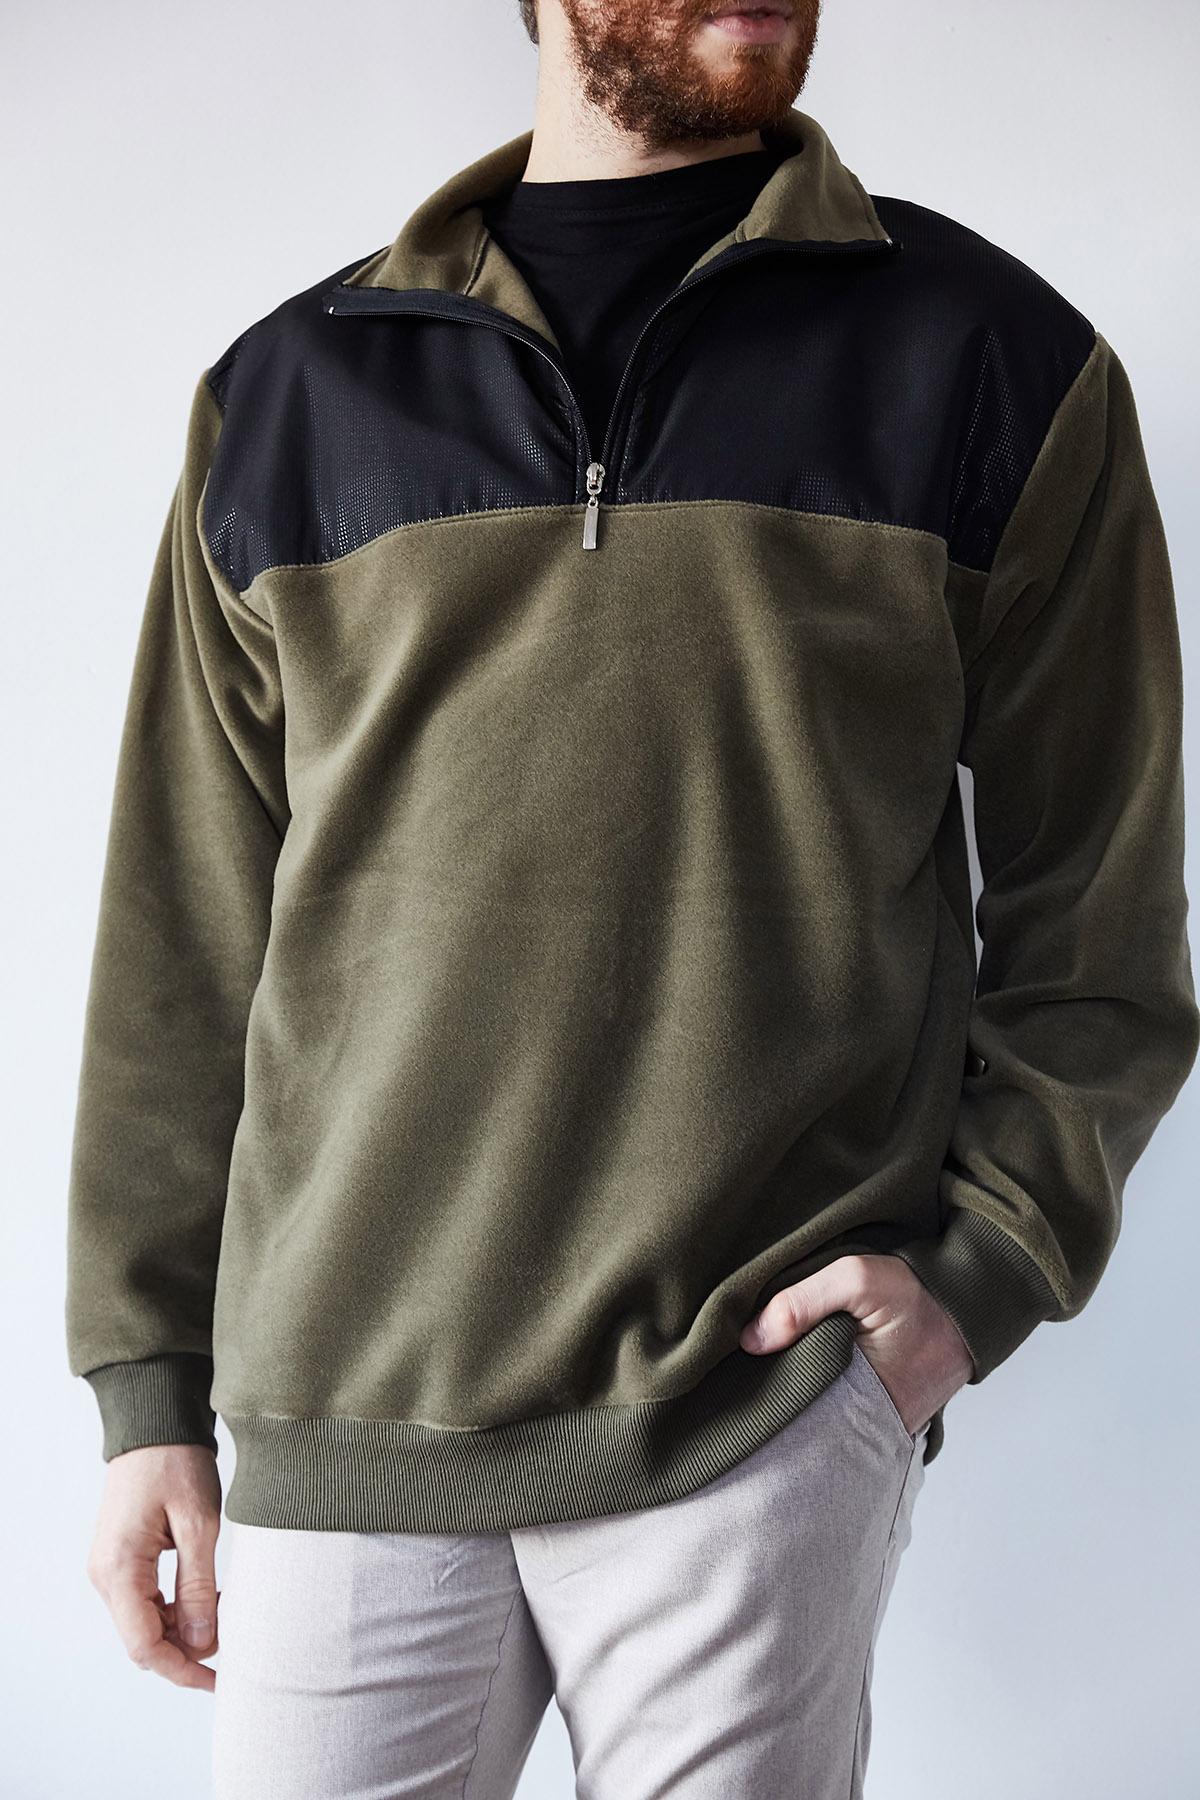 - Haki Deri Garnili Polar Sweatshirt 1KXE8-44233-09